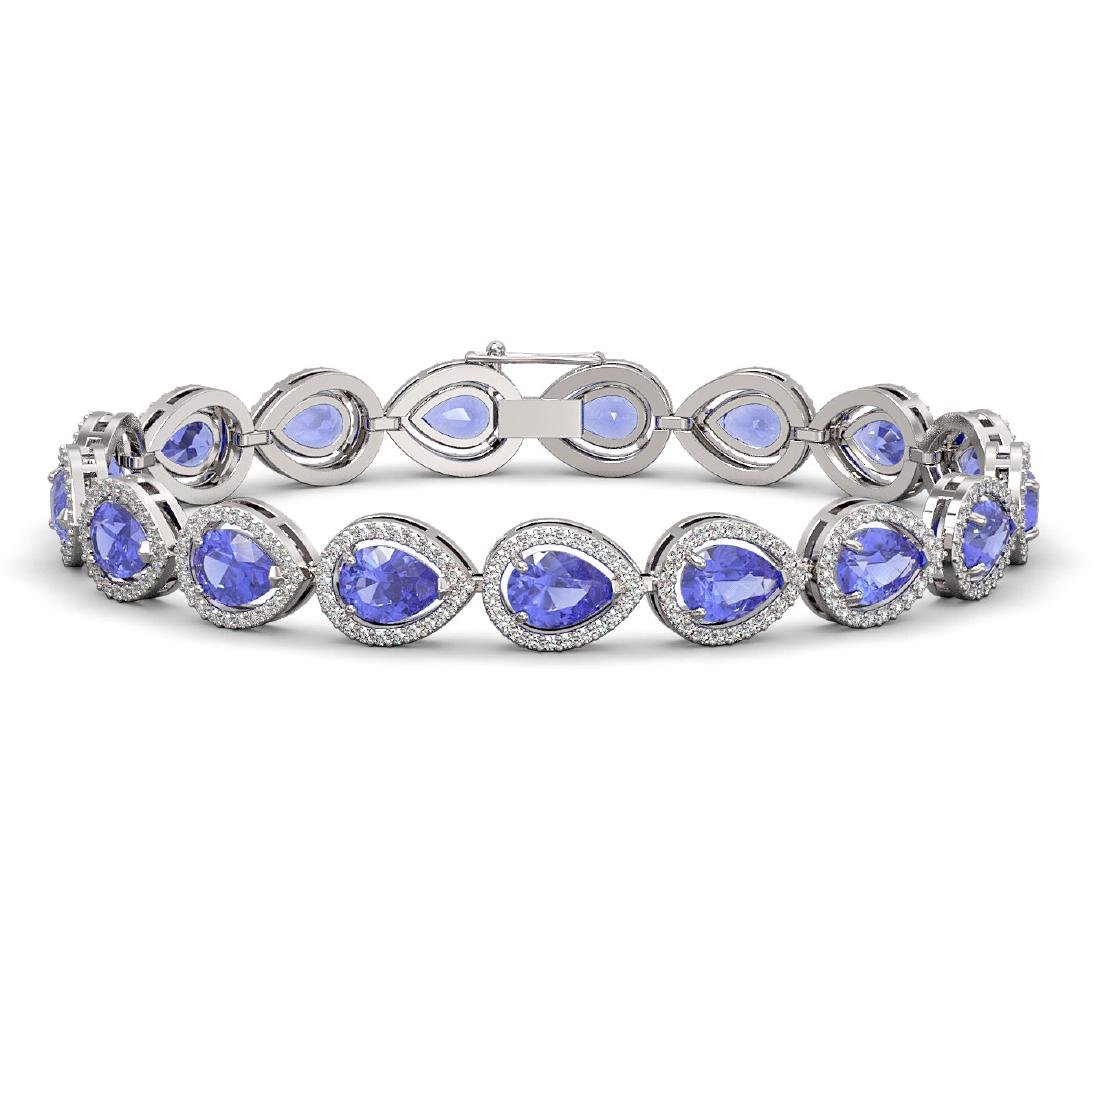 19.14 CTW Tanzanite & Diamond Halo Bracelet 10K White